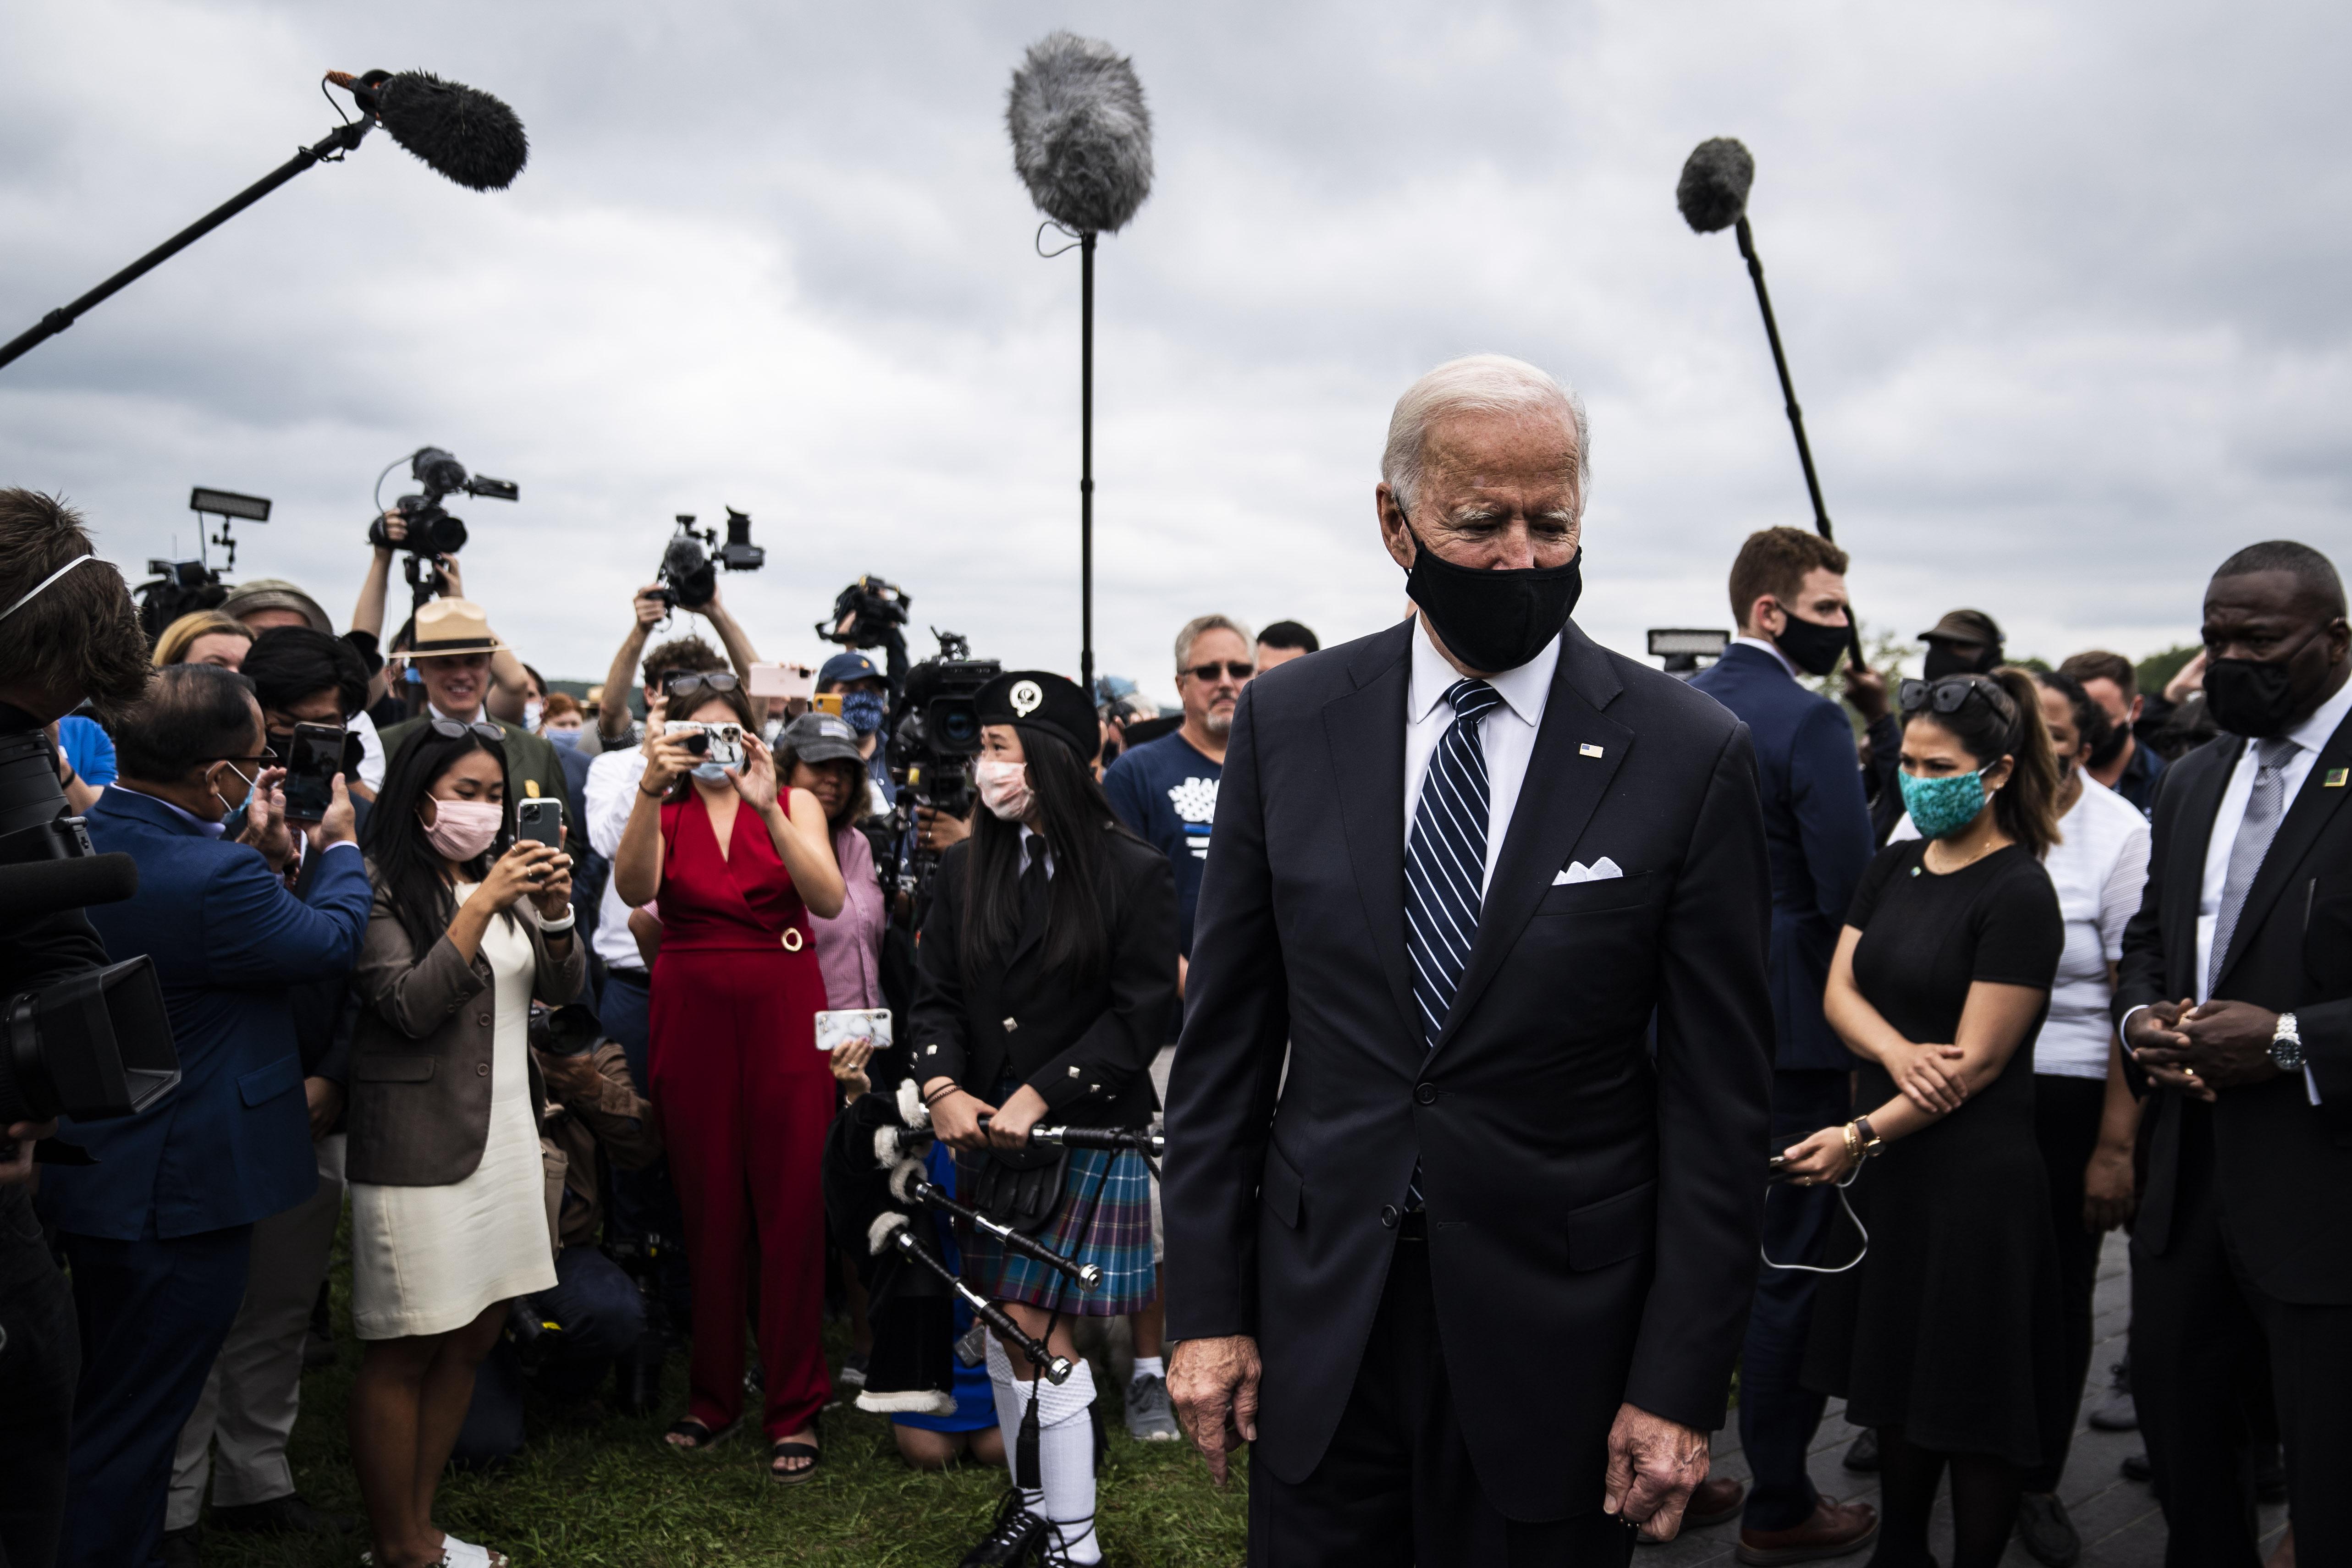 El presidente electo Joe Biden durante un evento en Shanksville, Pensilvania.   FOTO: Jabin Botsford — The Washington Post  